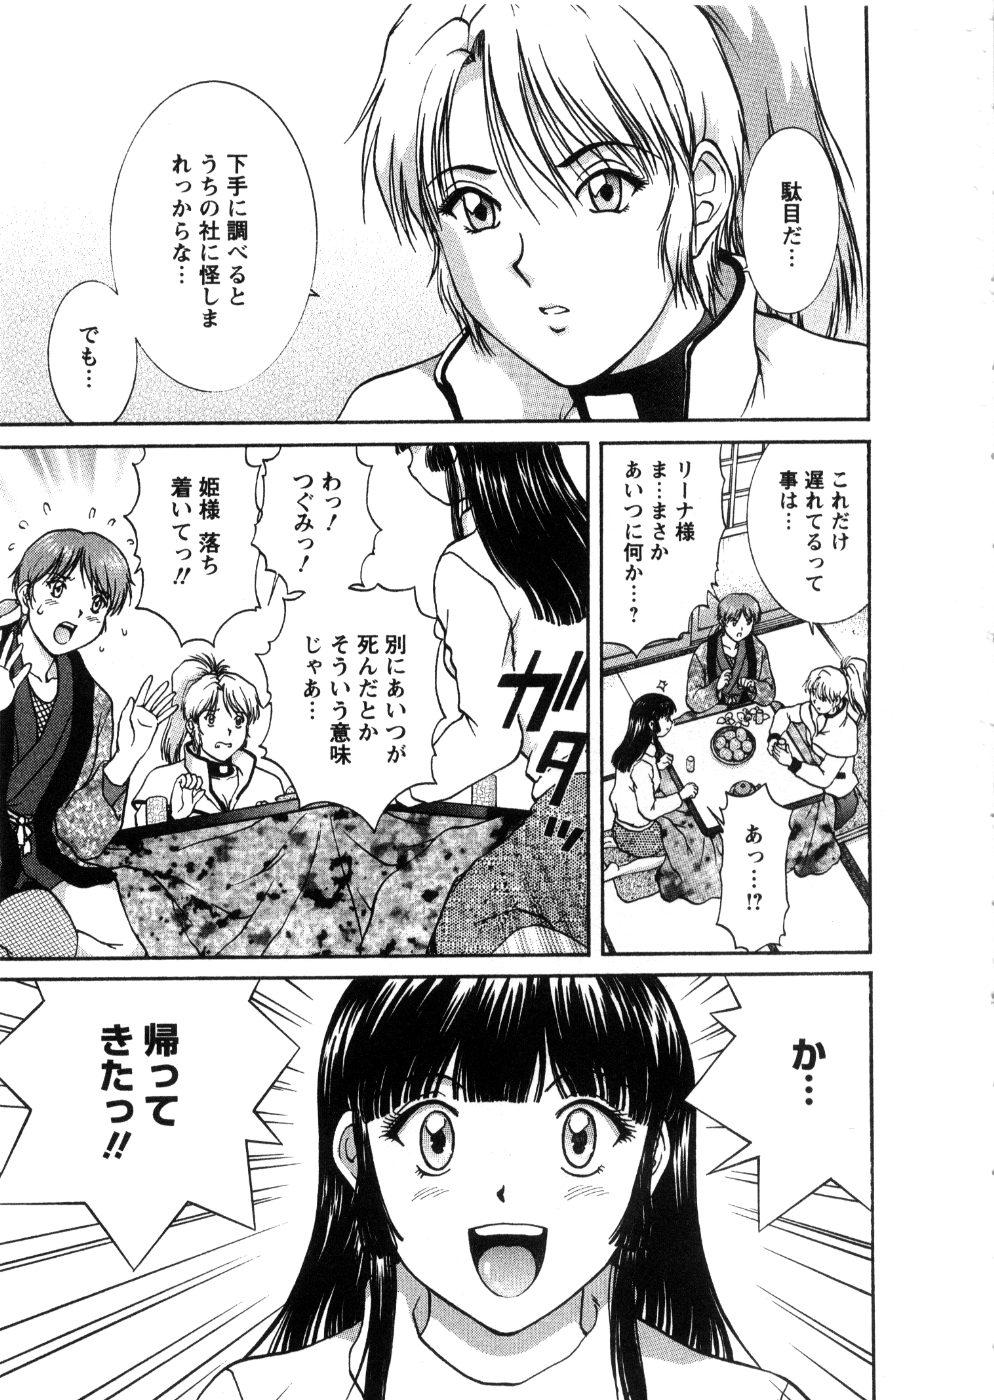 Oneechan-tachi ga Yatte Kuru 03 50